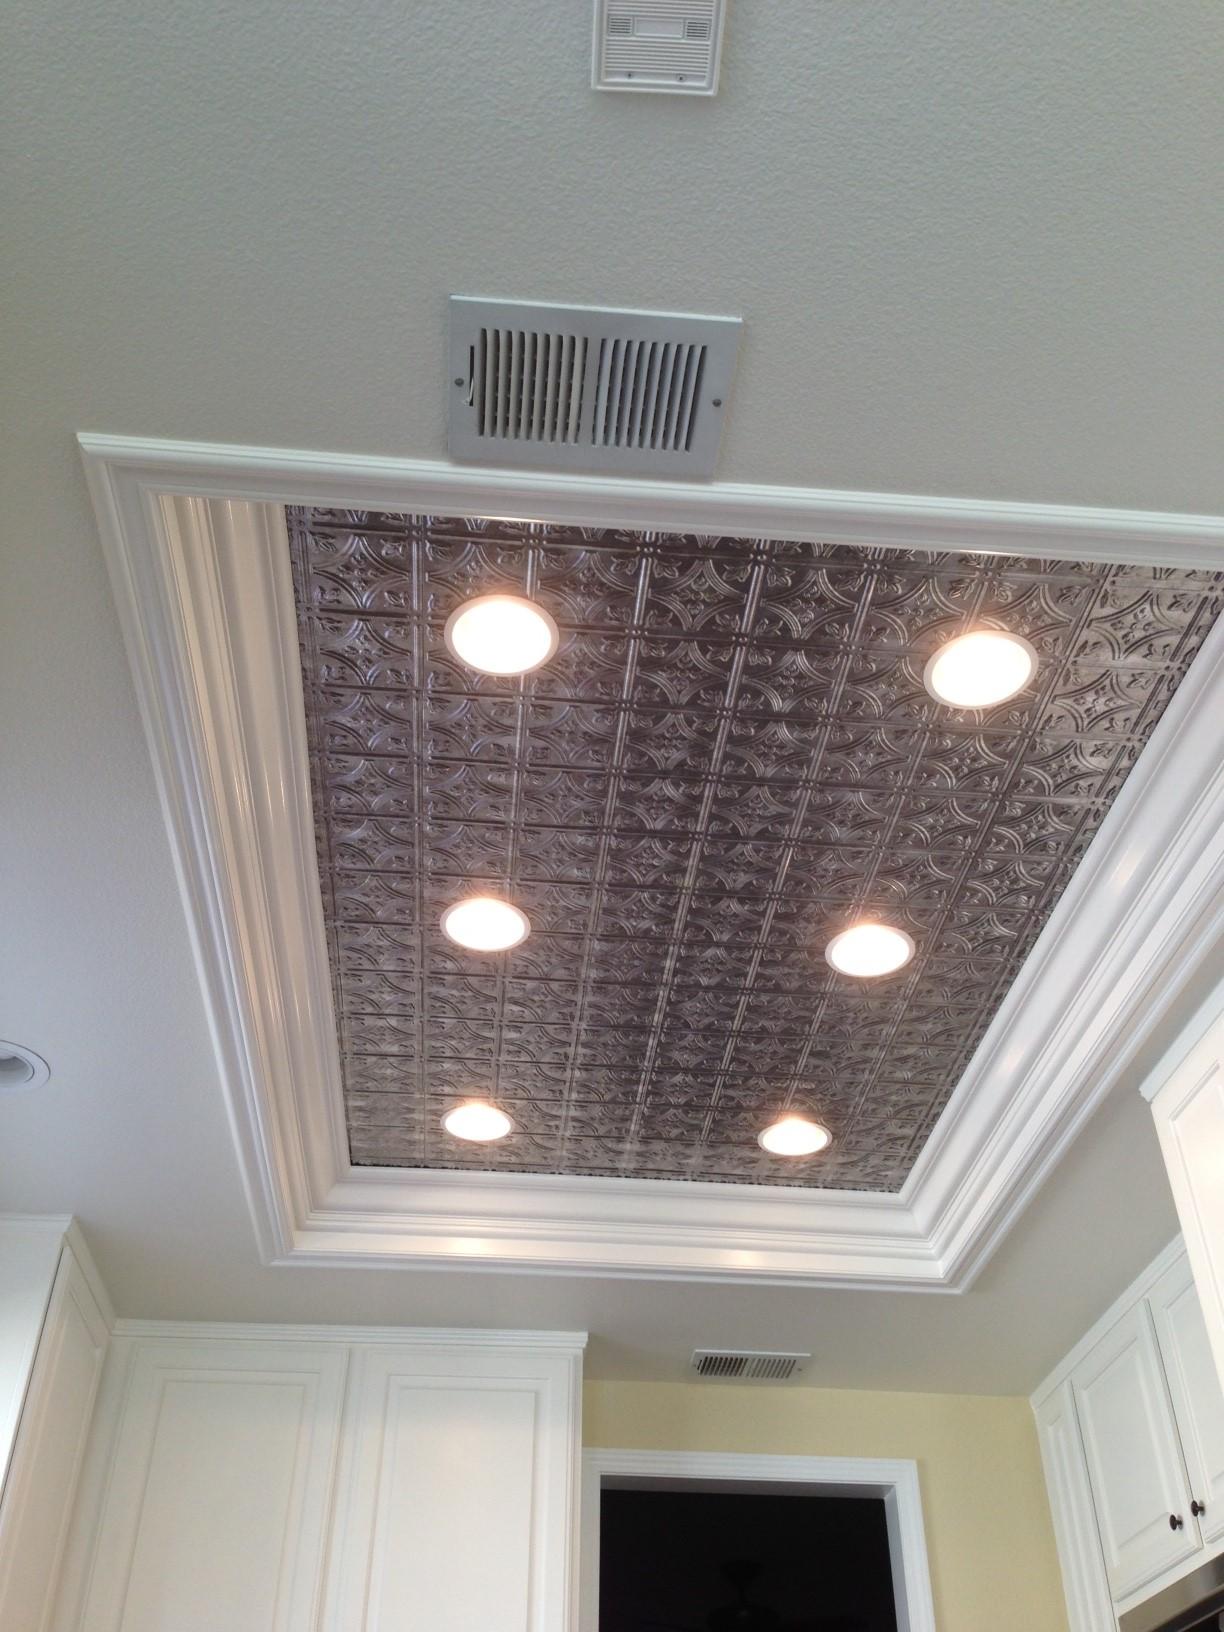 fluorescent ceiling lights photo - 6